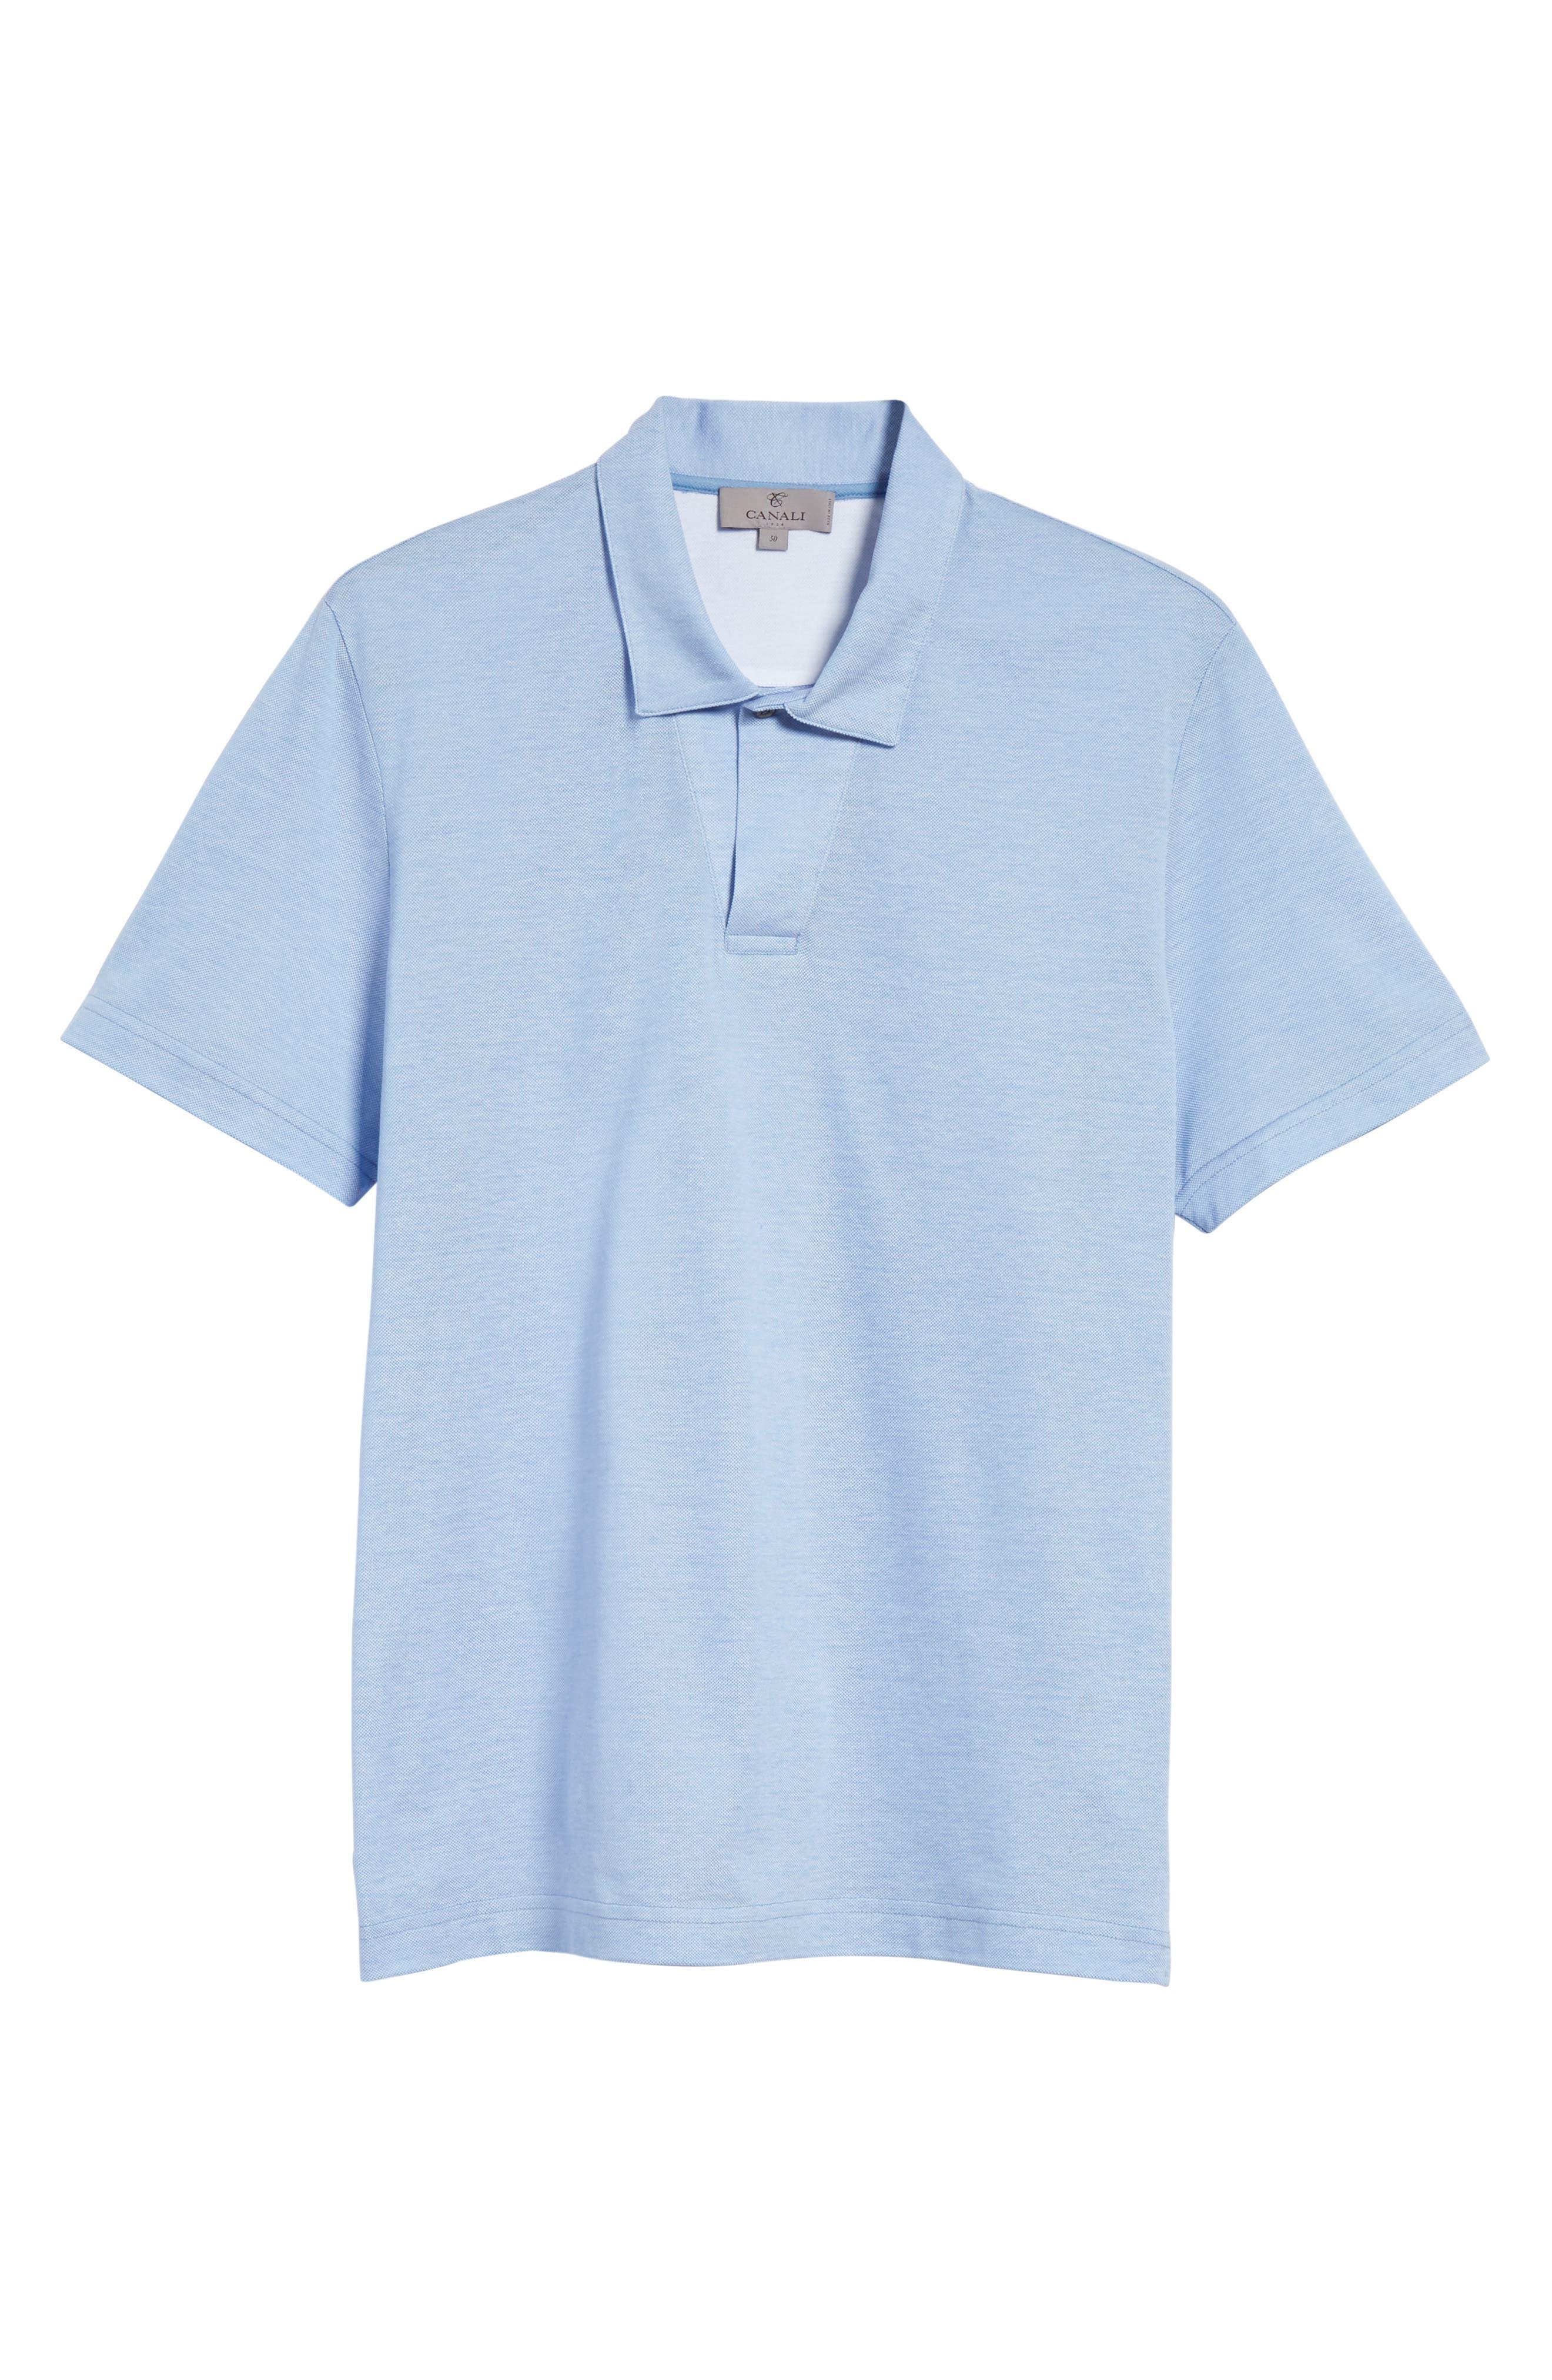 Piqué Polo Shirt,                             Alternate thumbnail 6, color,                             Sky Blue